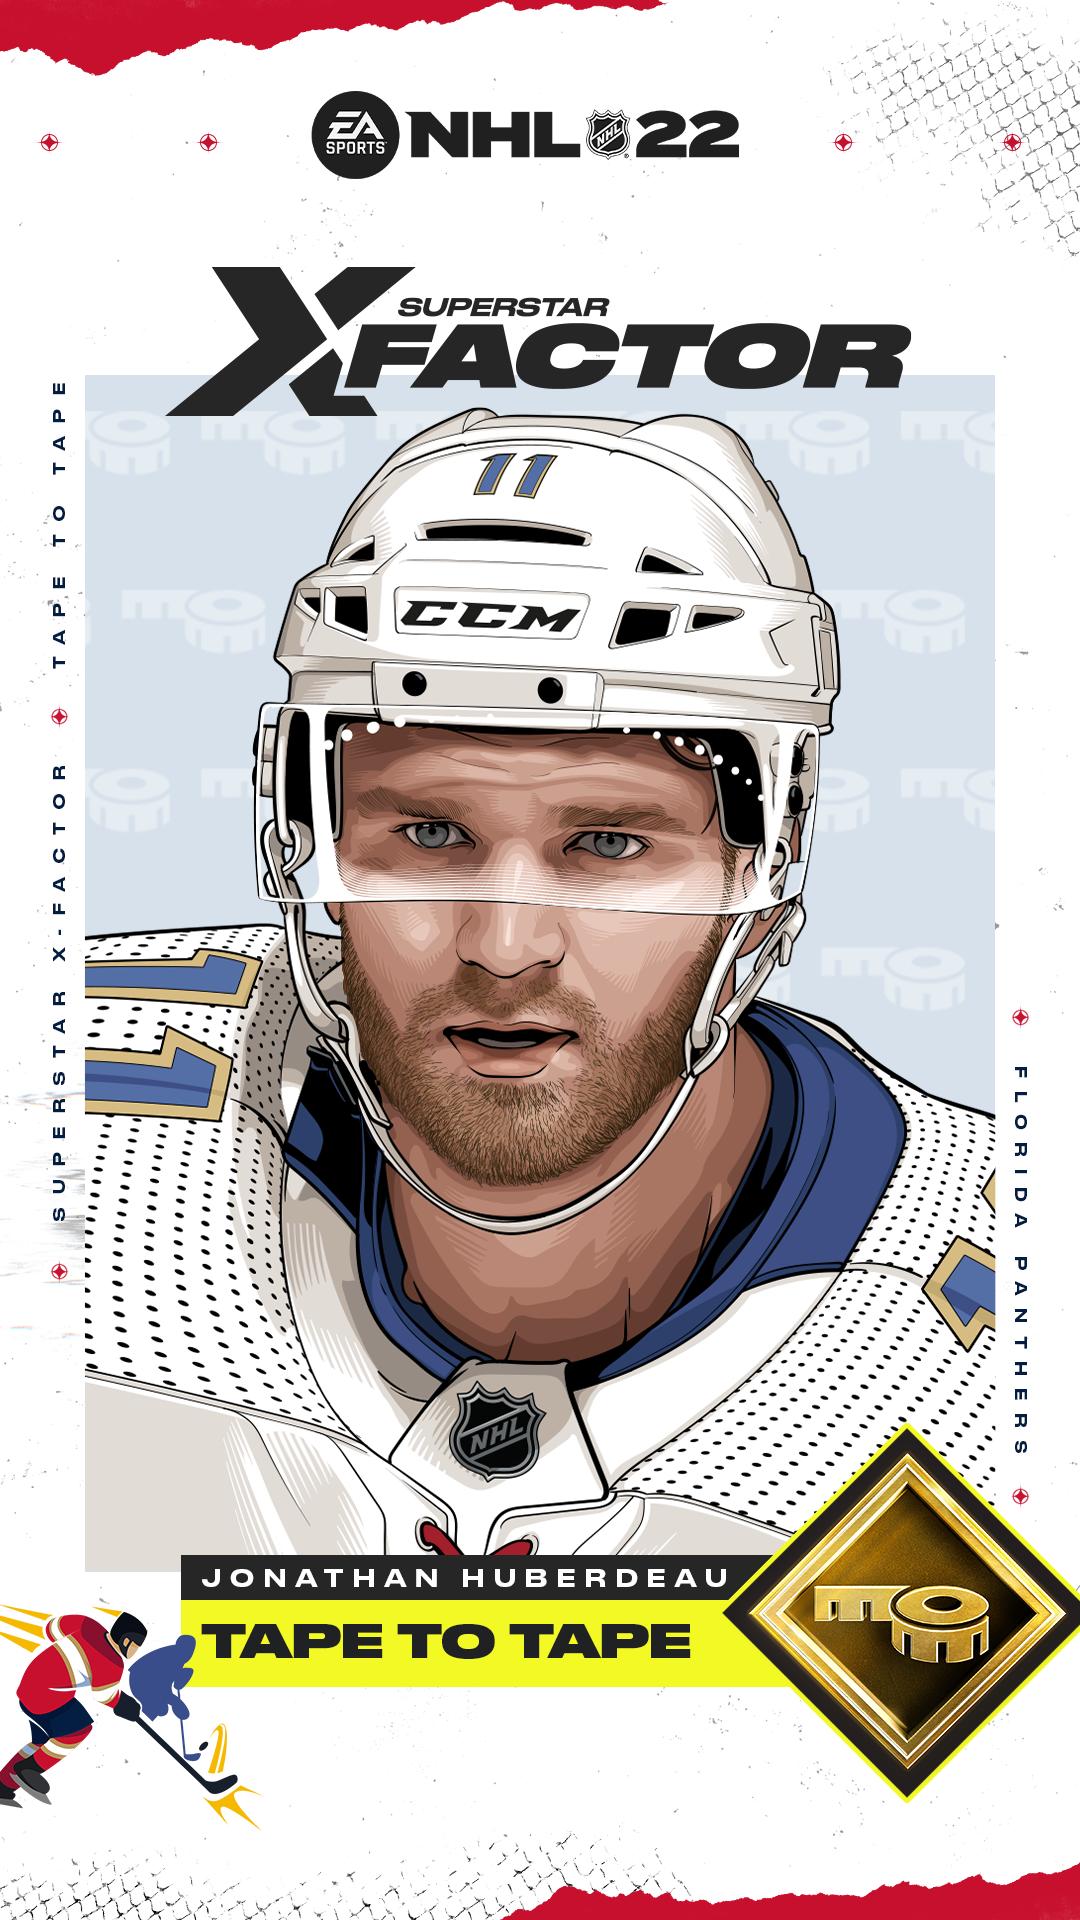 NHL22_XFactor_JonathanHuberdeau_9x16